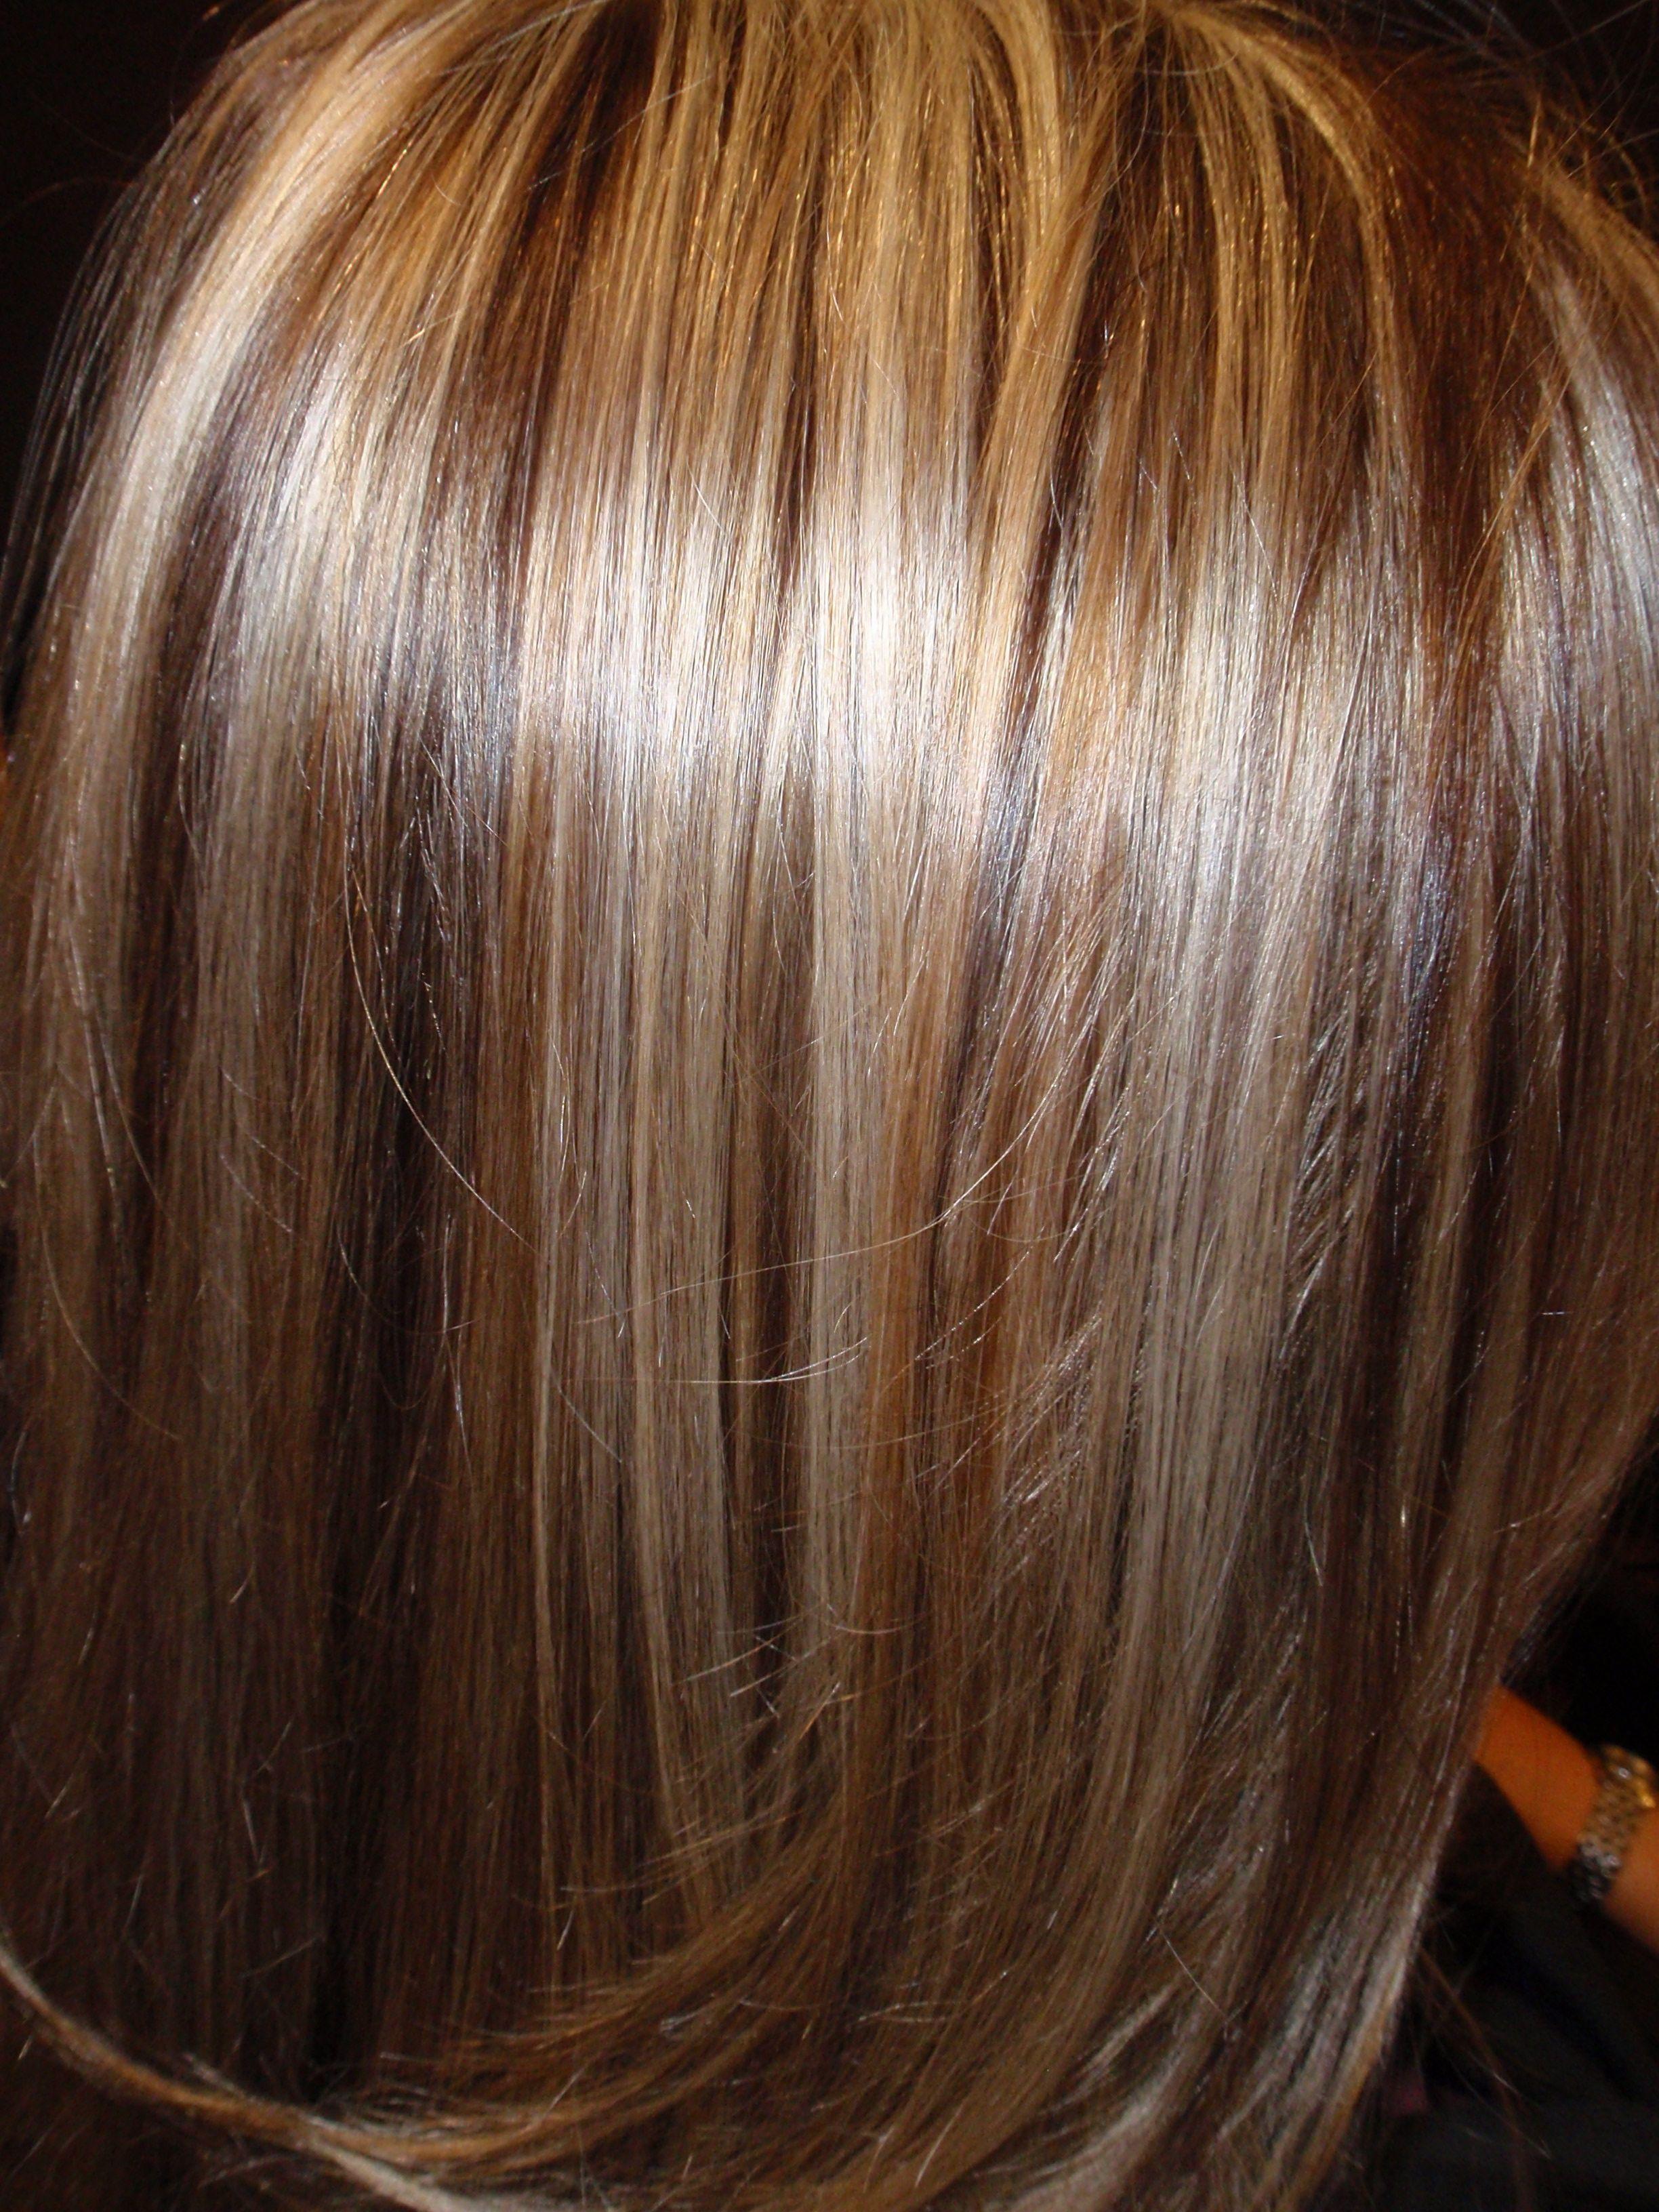 Pin by brandy furbee on hair pinterest chocolate brown low